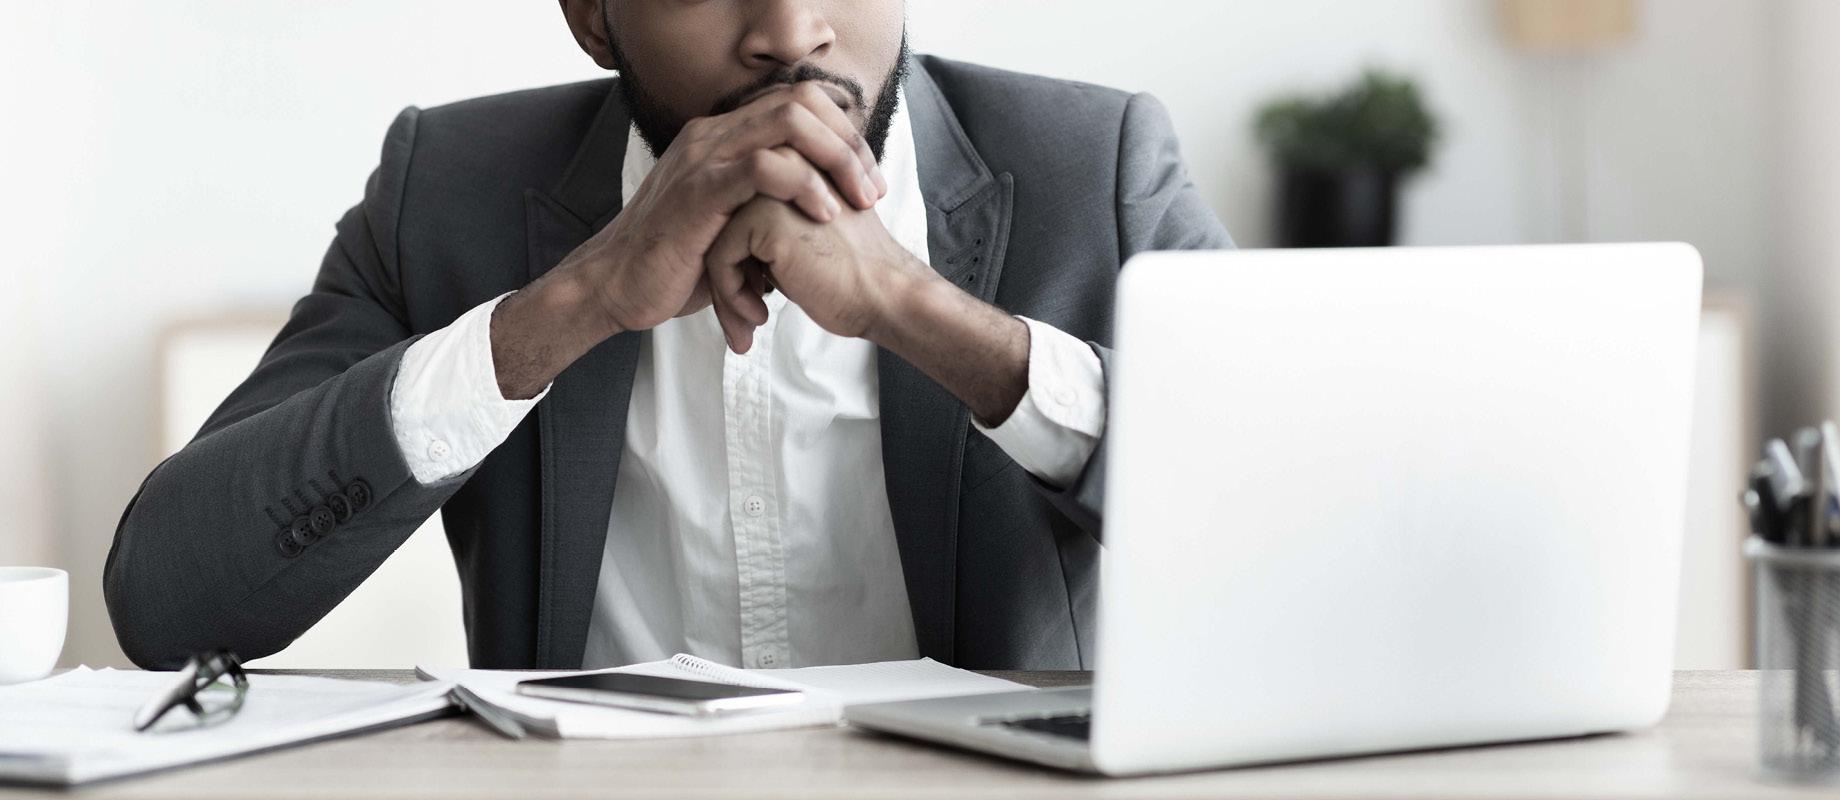 Avoid Mistakes & Maintain HIPAA Compliance in Our Newest CCB Webinar